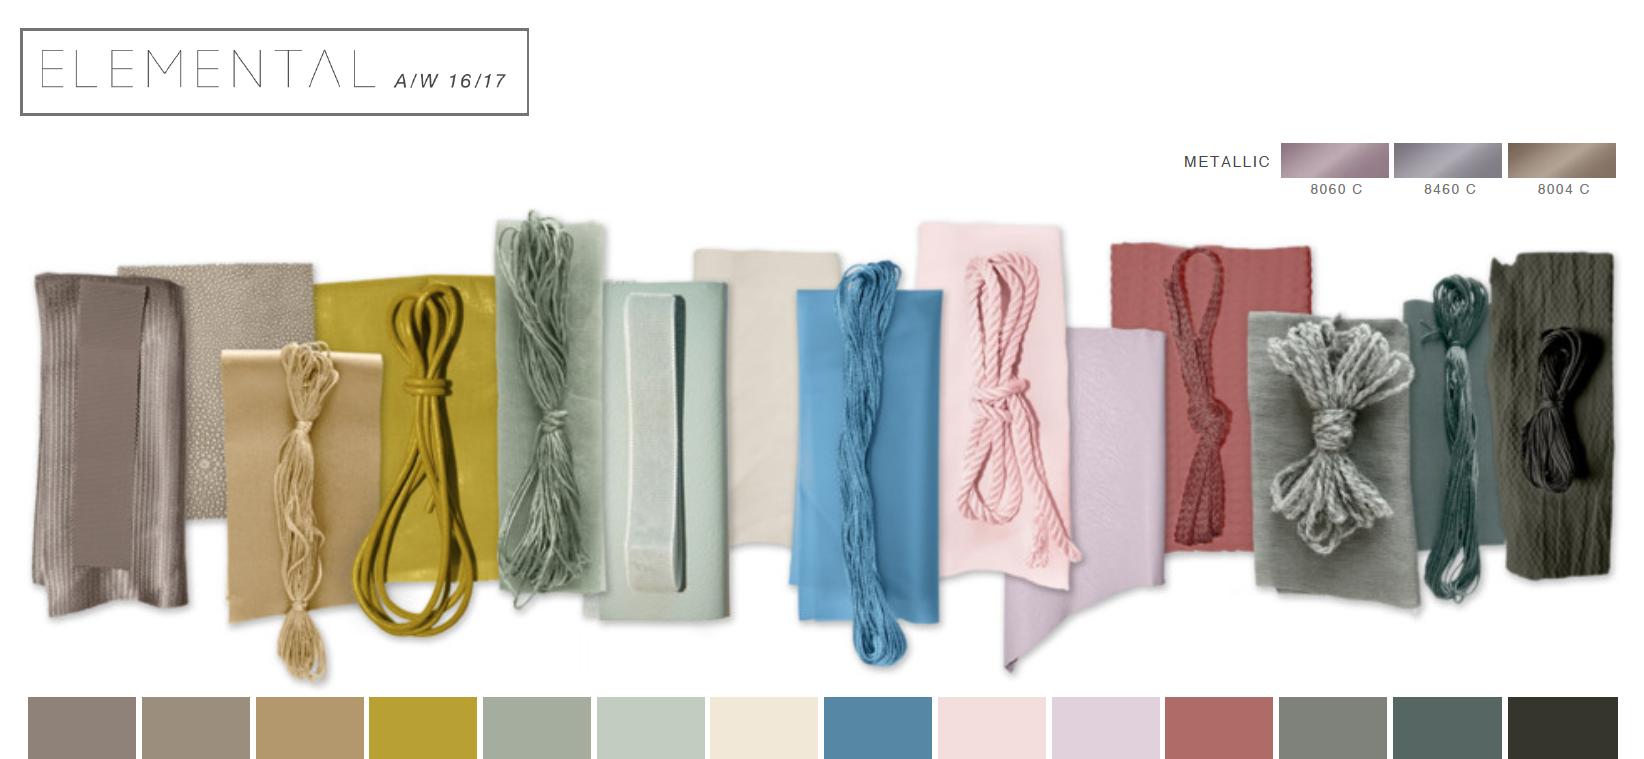 Colour palette by WGSN   Mega Trend AW 16/17 - ELEMENTAL ...